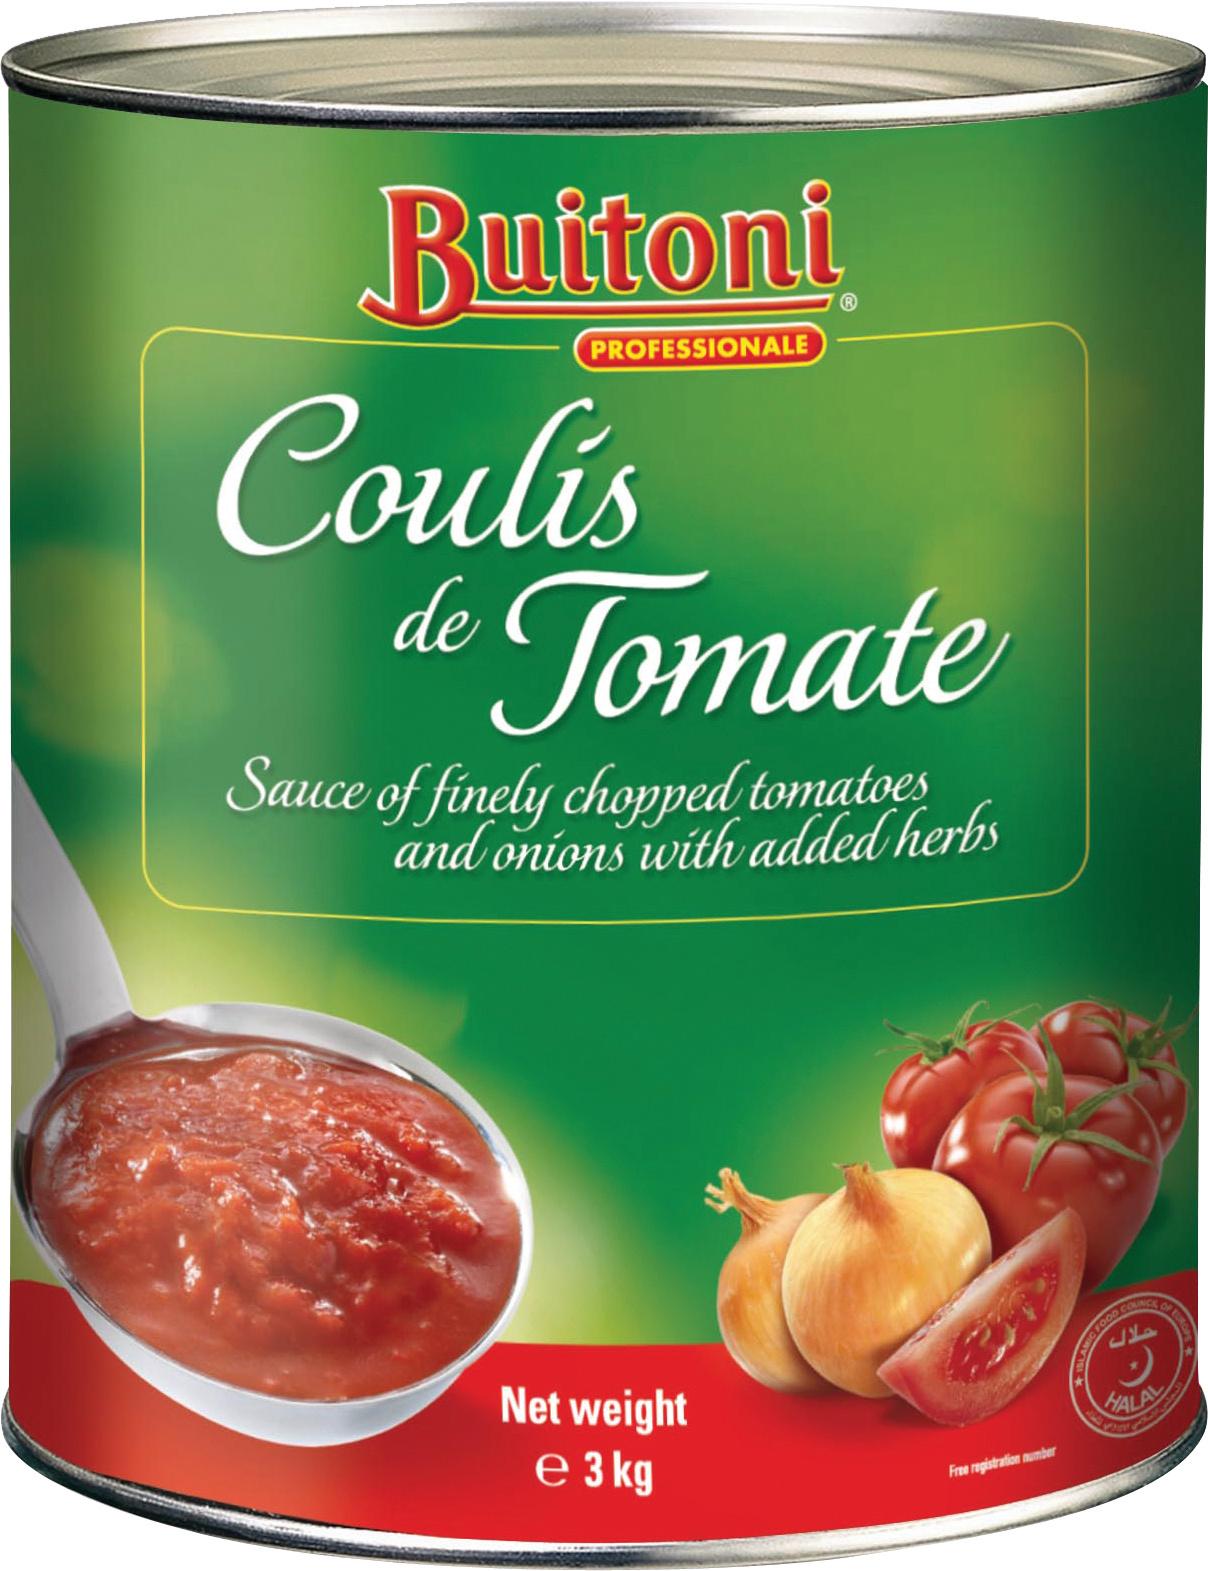 BUITONI Coulis de Tomate 6x3kg